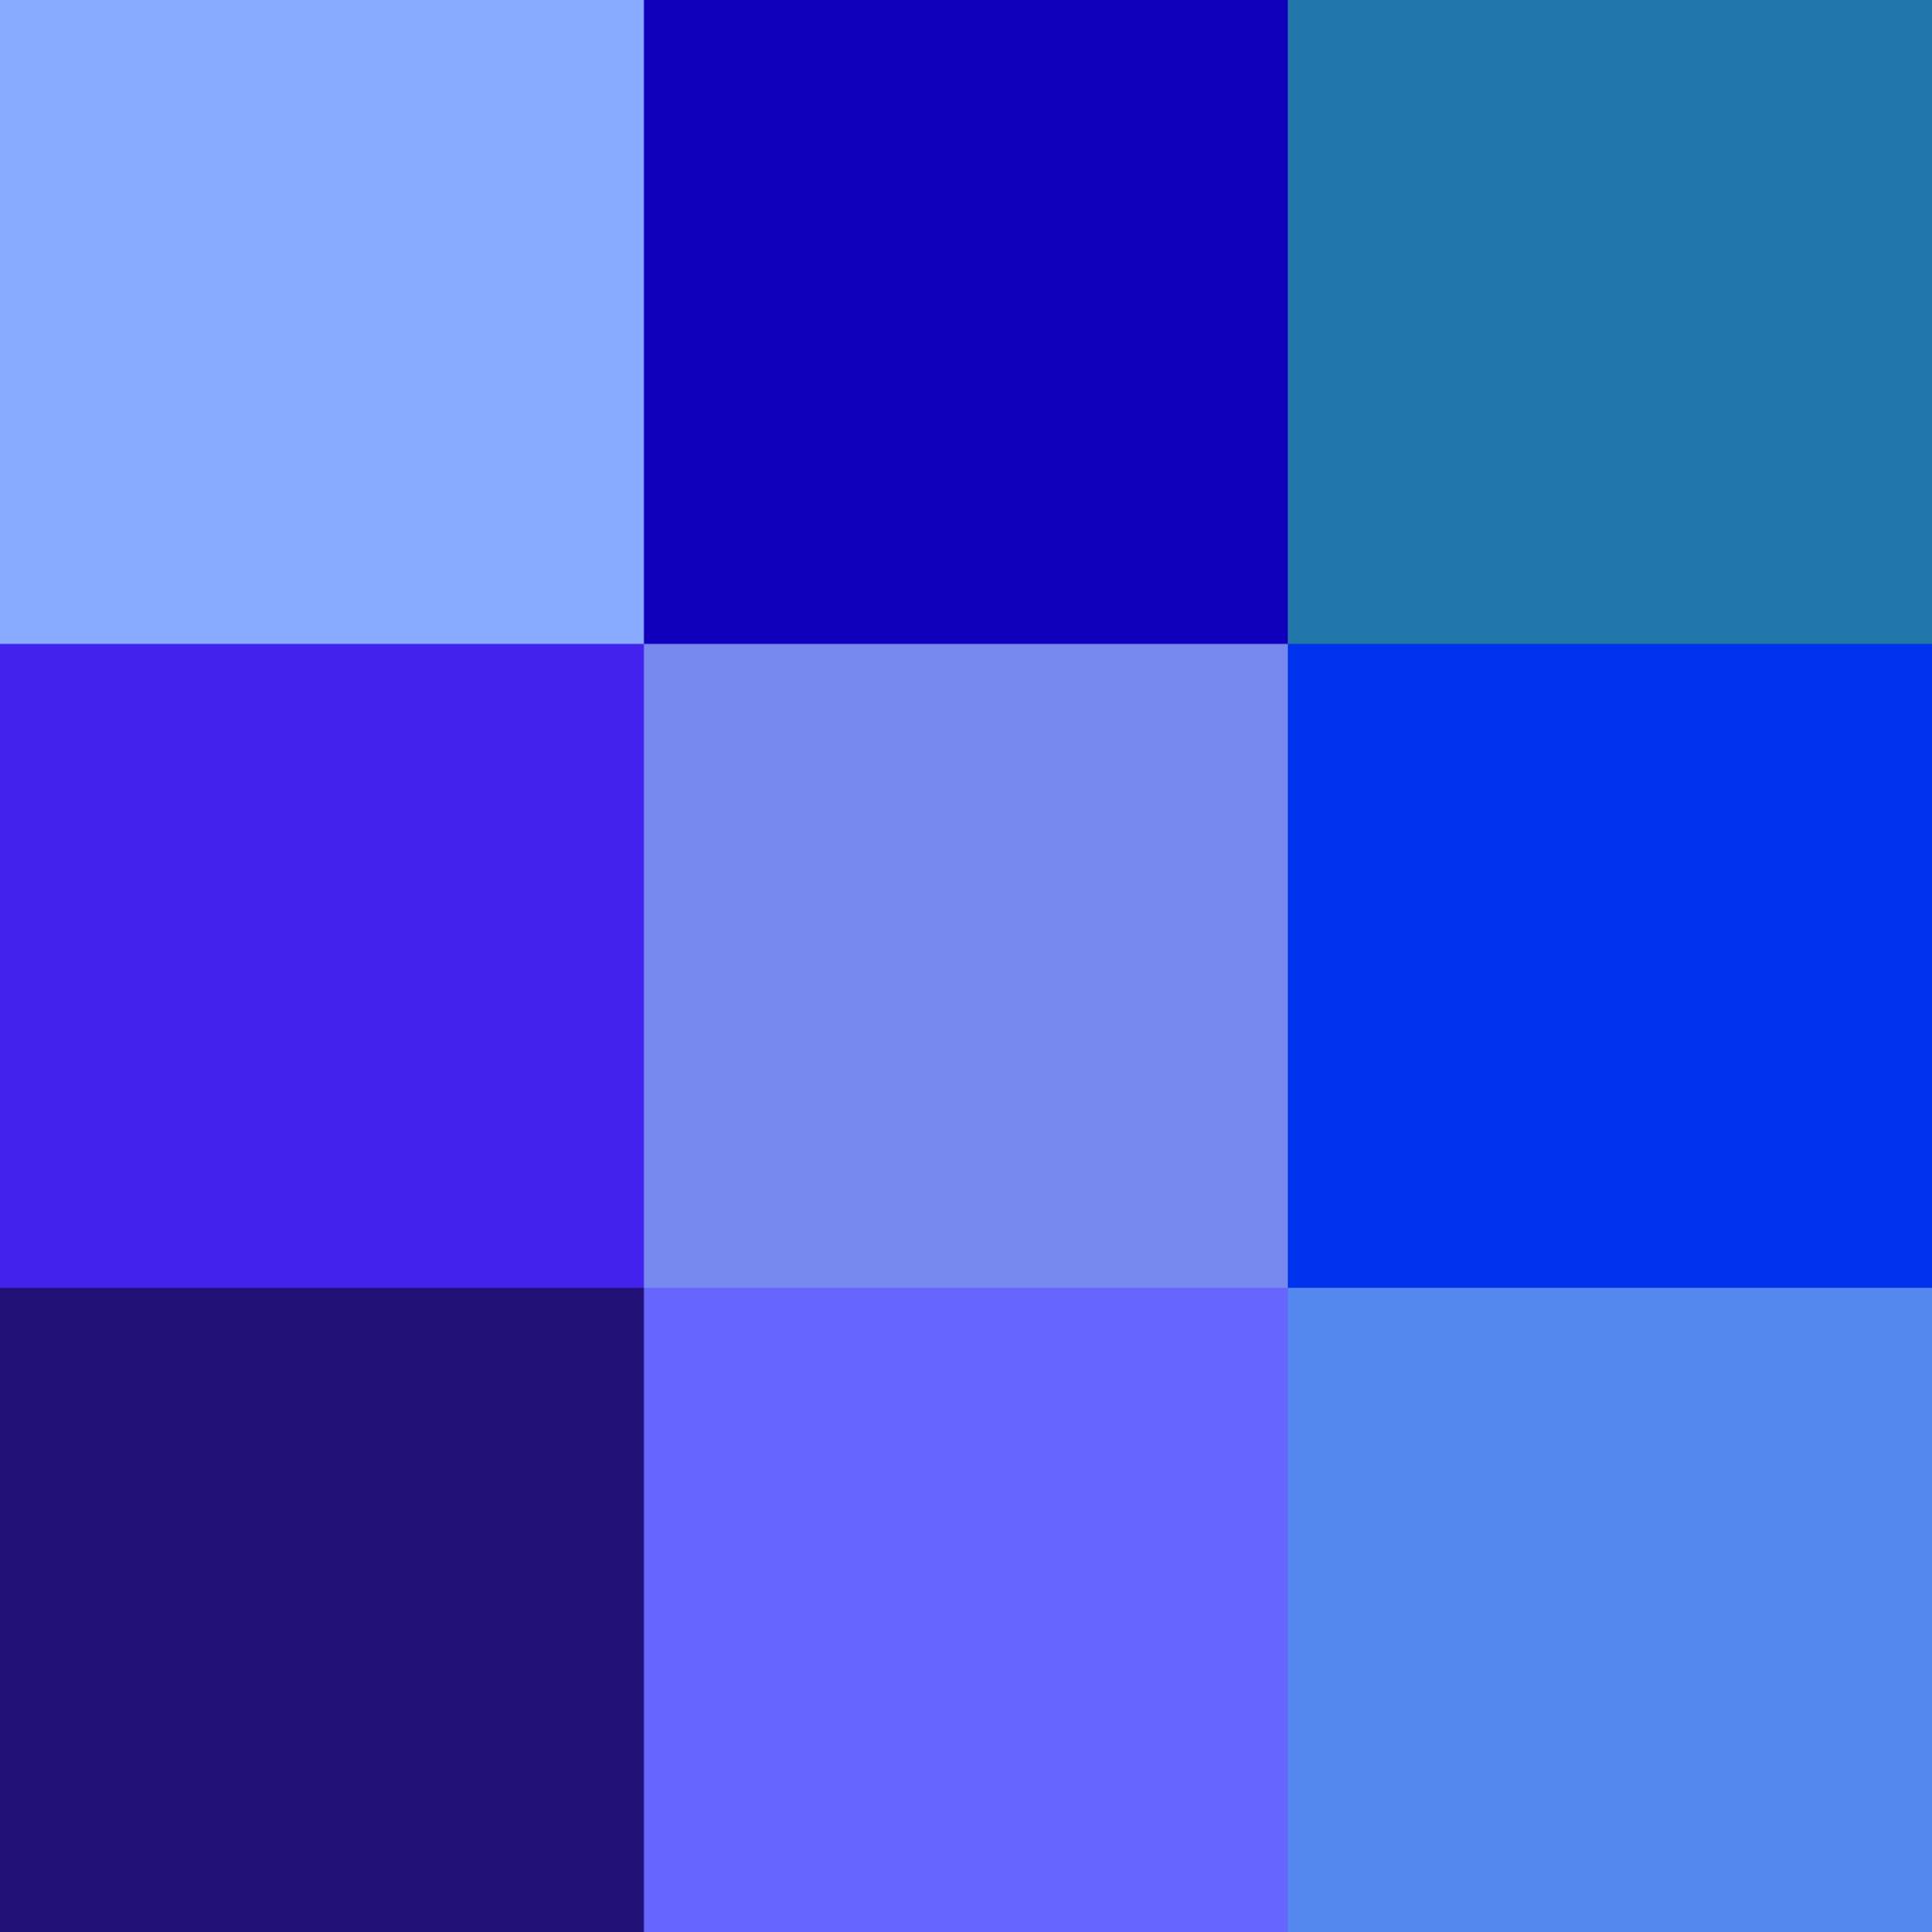 Cmyk Wallpaper Hd Blue Dr Odd